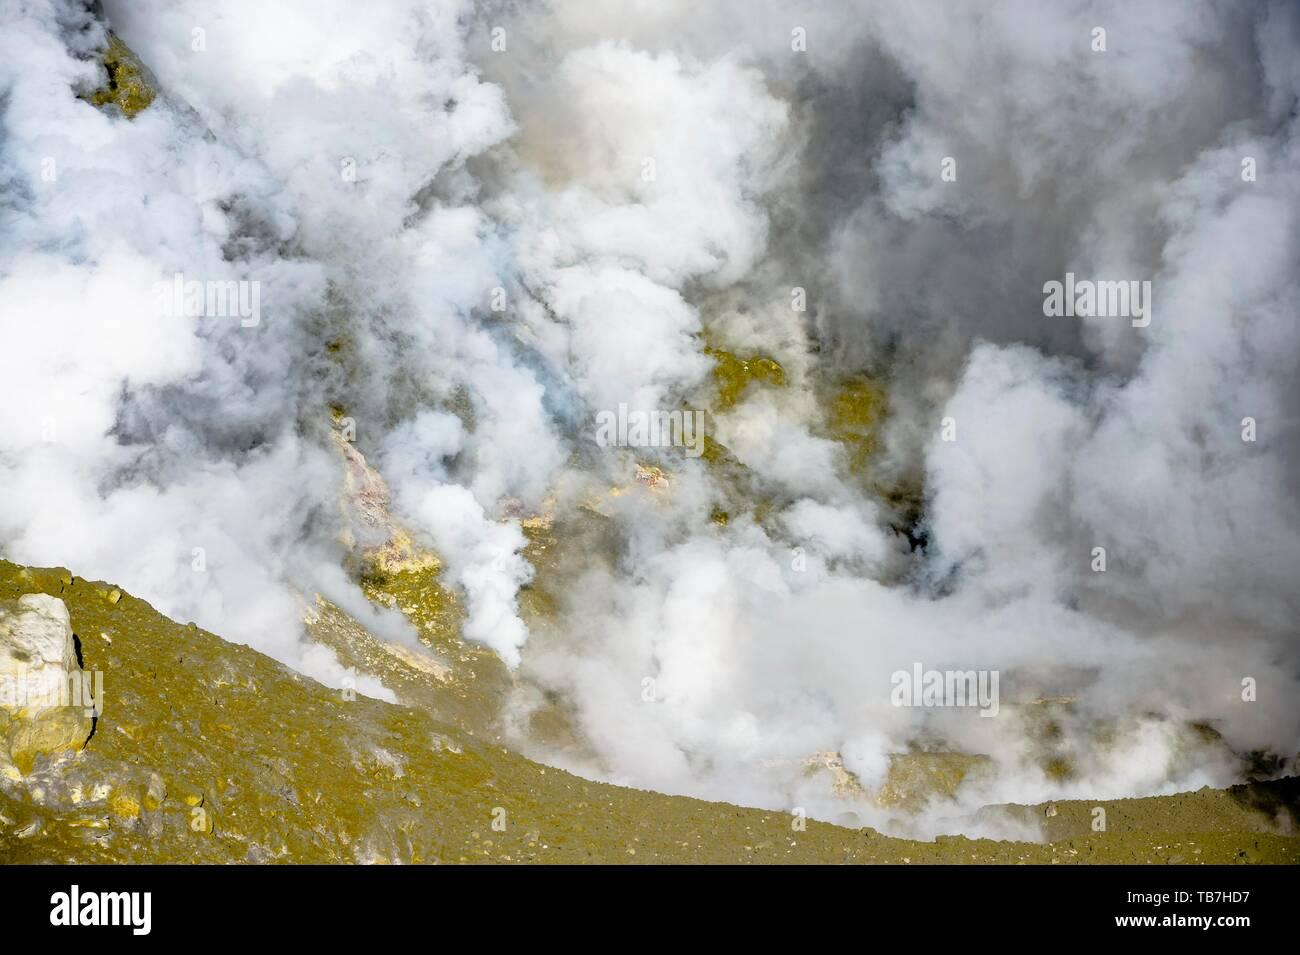 Fumaroles on the volcano White Island, Whakaari, Bay of Plenty, North Island, New Zealand - Stock Image